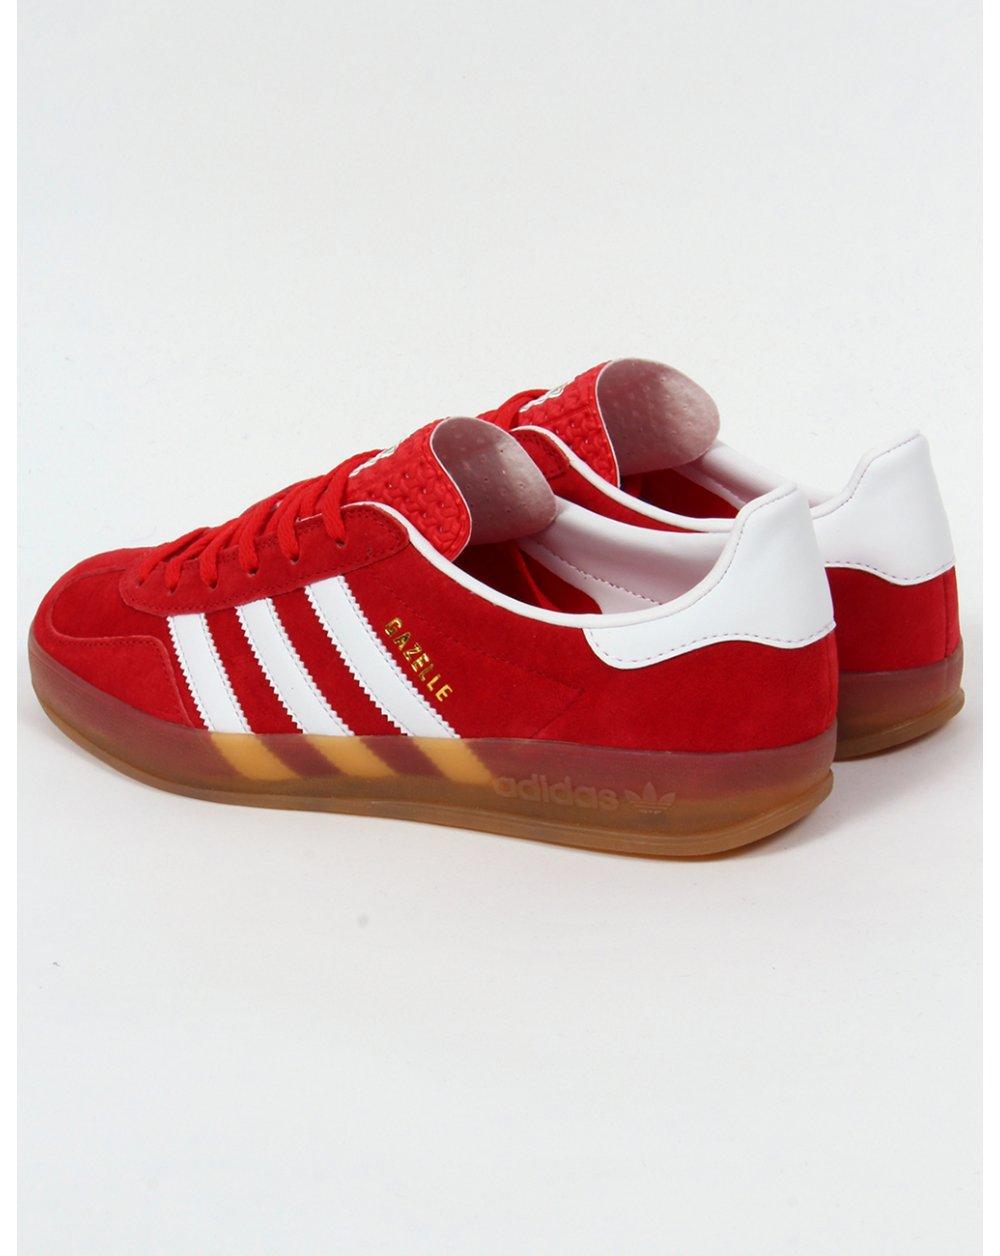 adidas indoor gazelle red